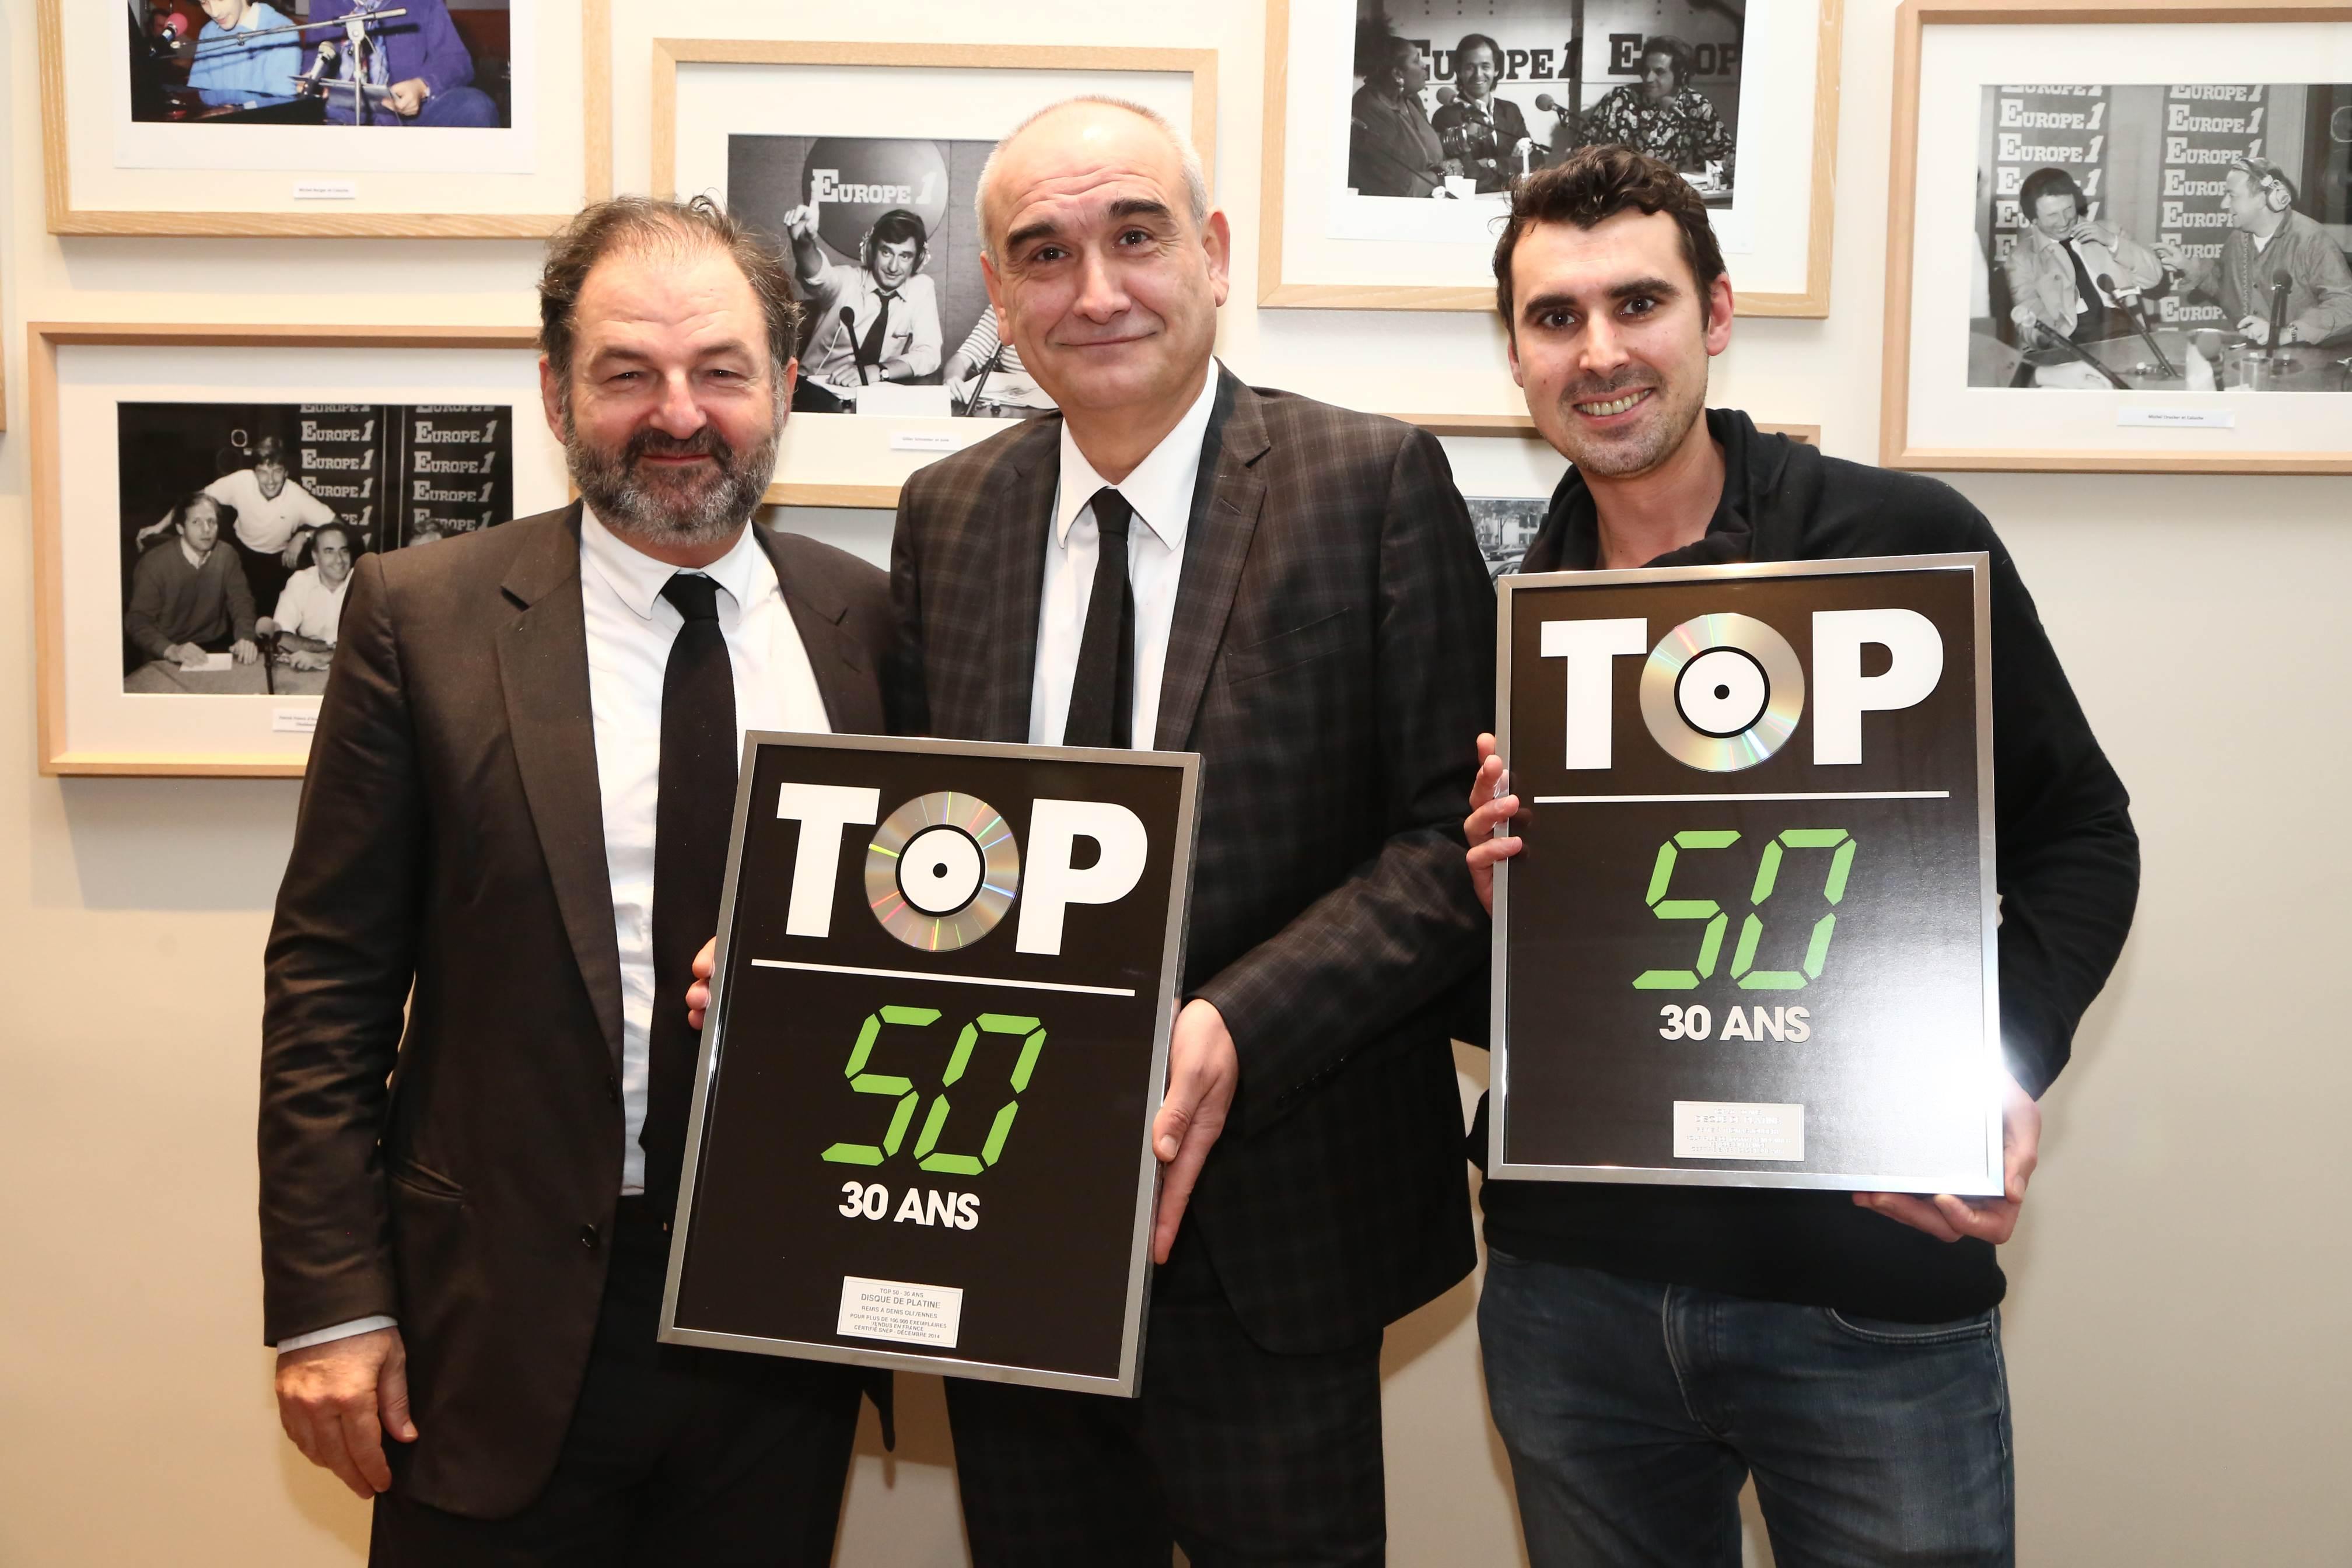 Denis Olivennes, Pascal Nègre et Thomas Joubert © Wladimir Simitc